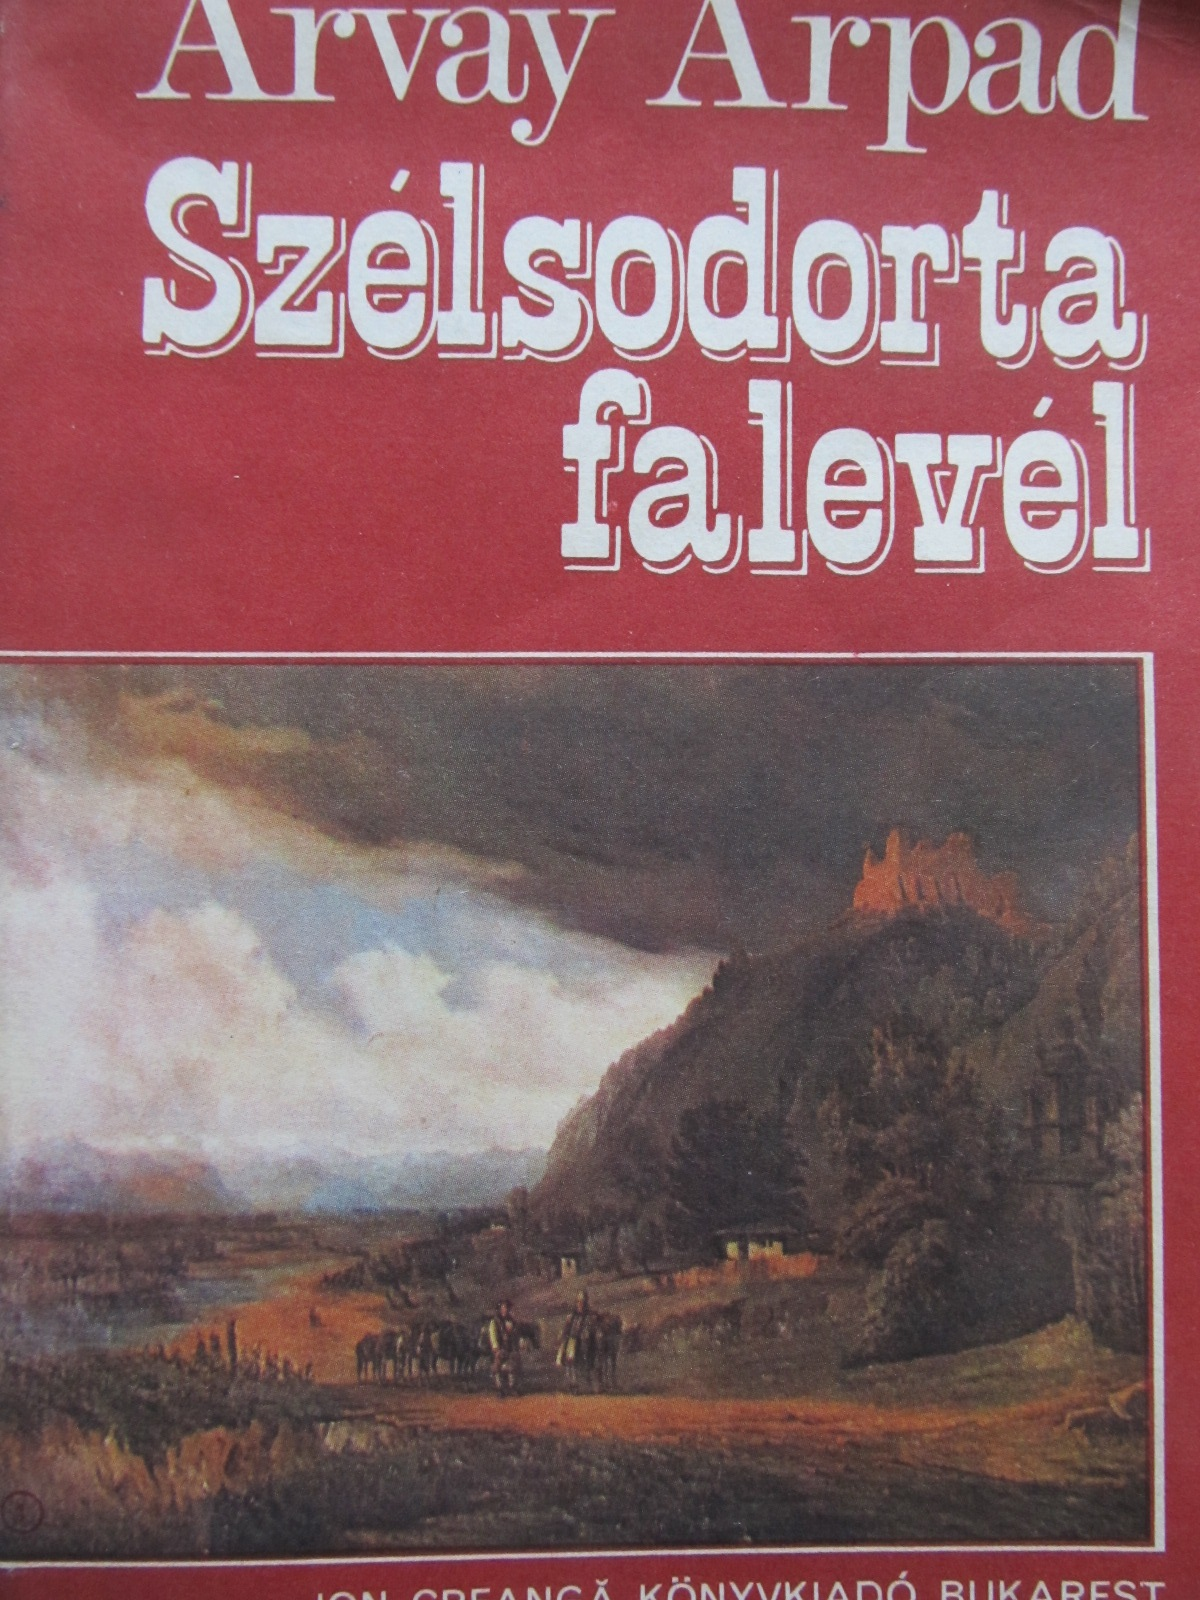 Carte Szelsodorta falevel - Arvay Arpad